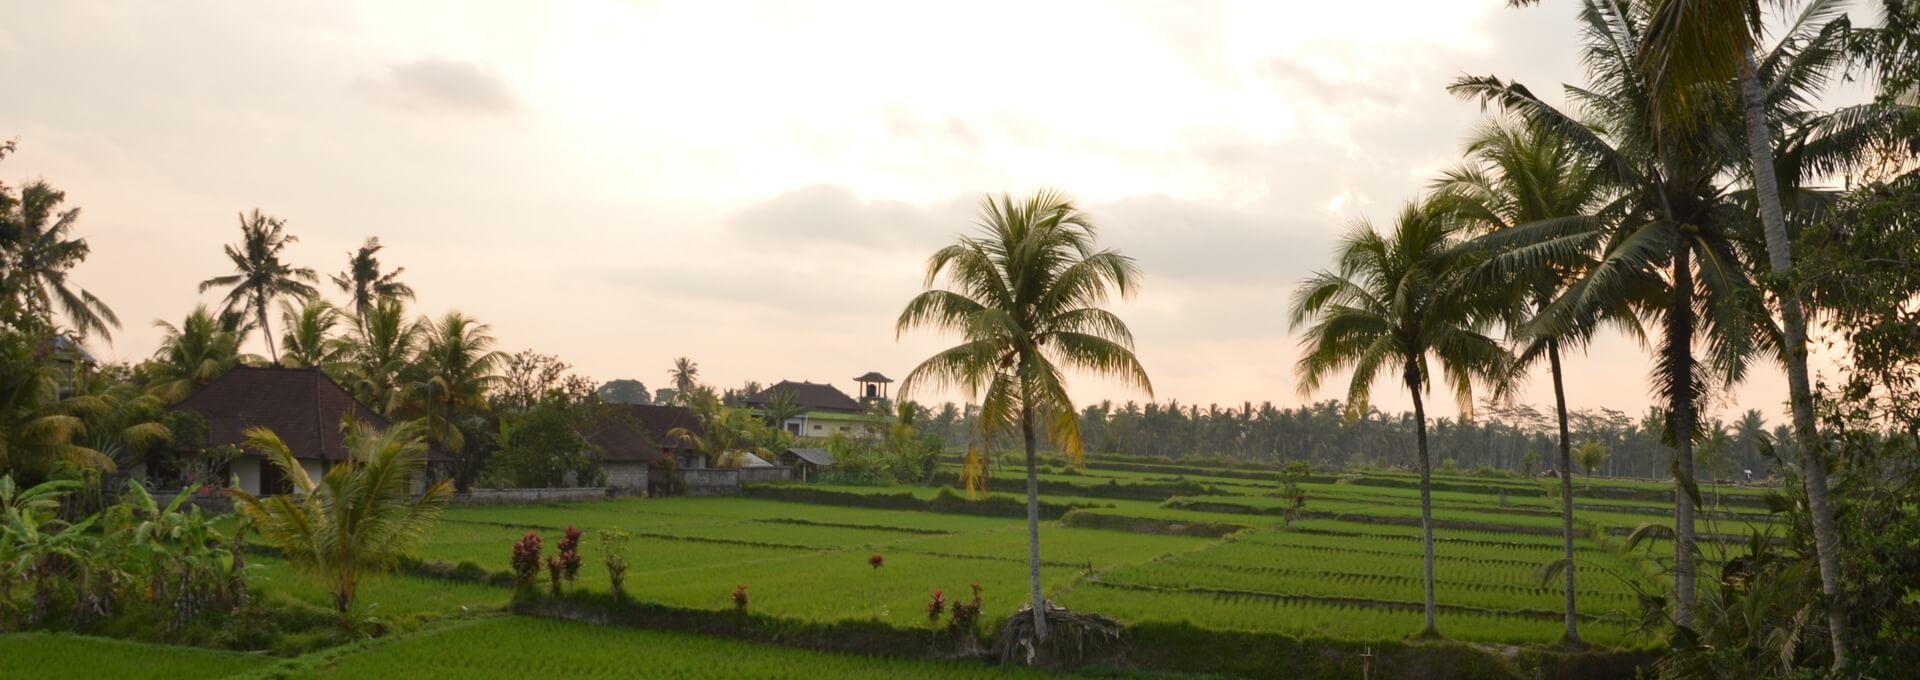 Bali, rizières d'Ubud